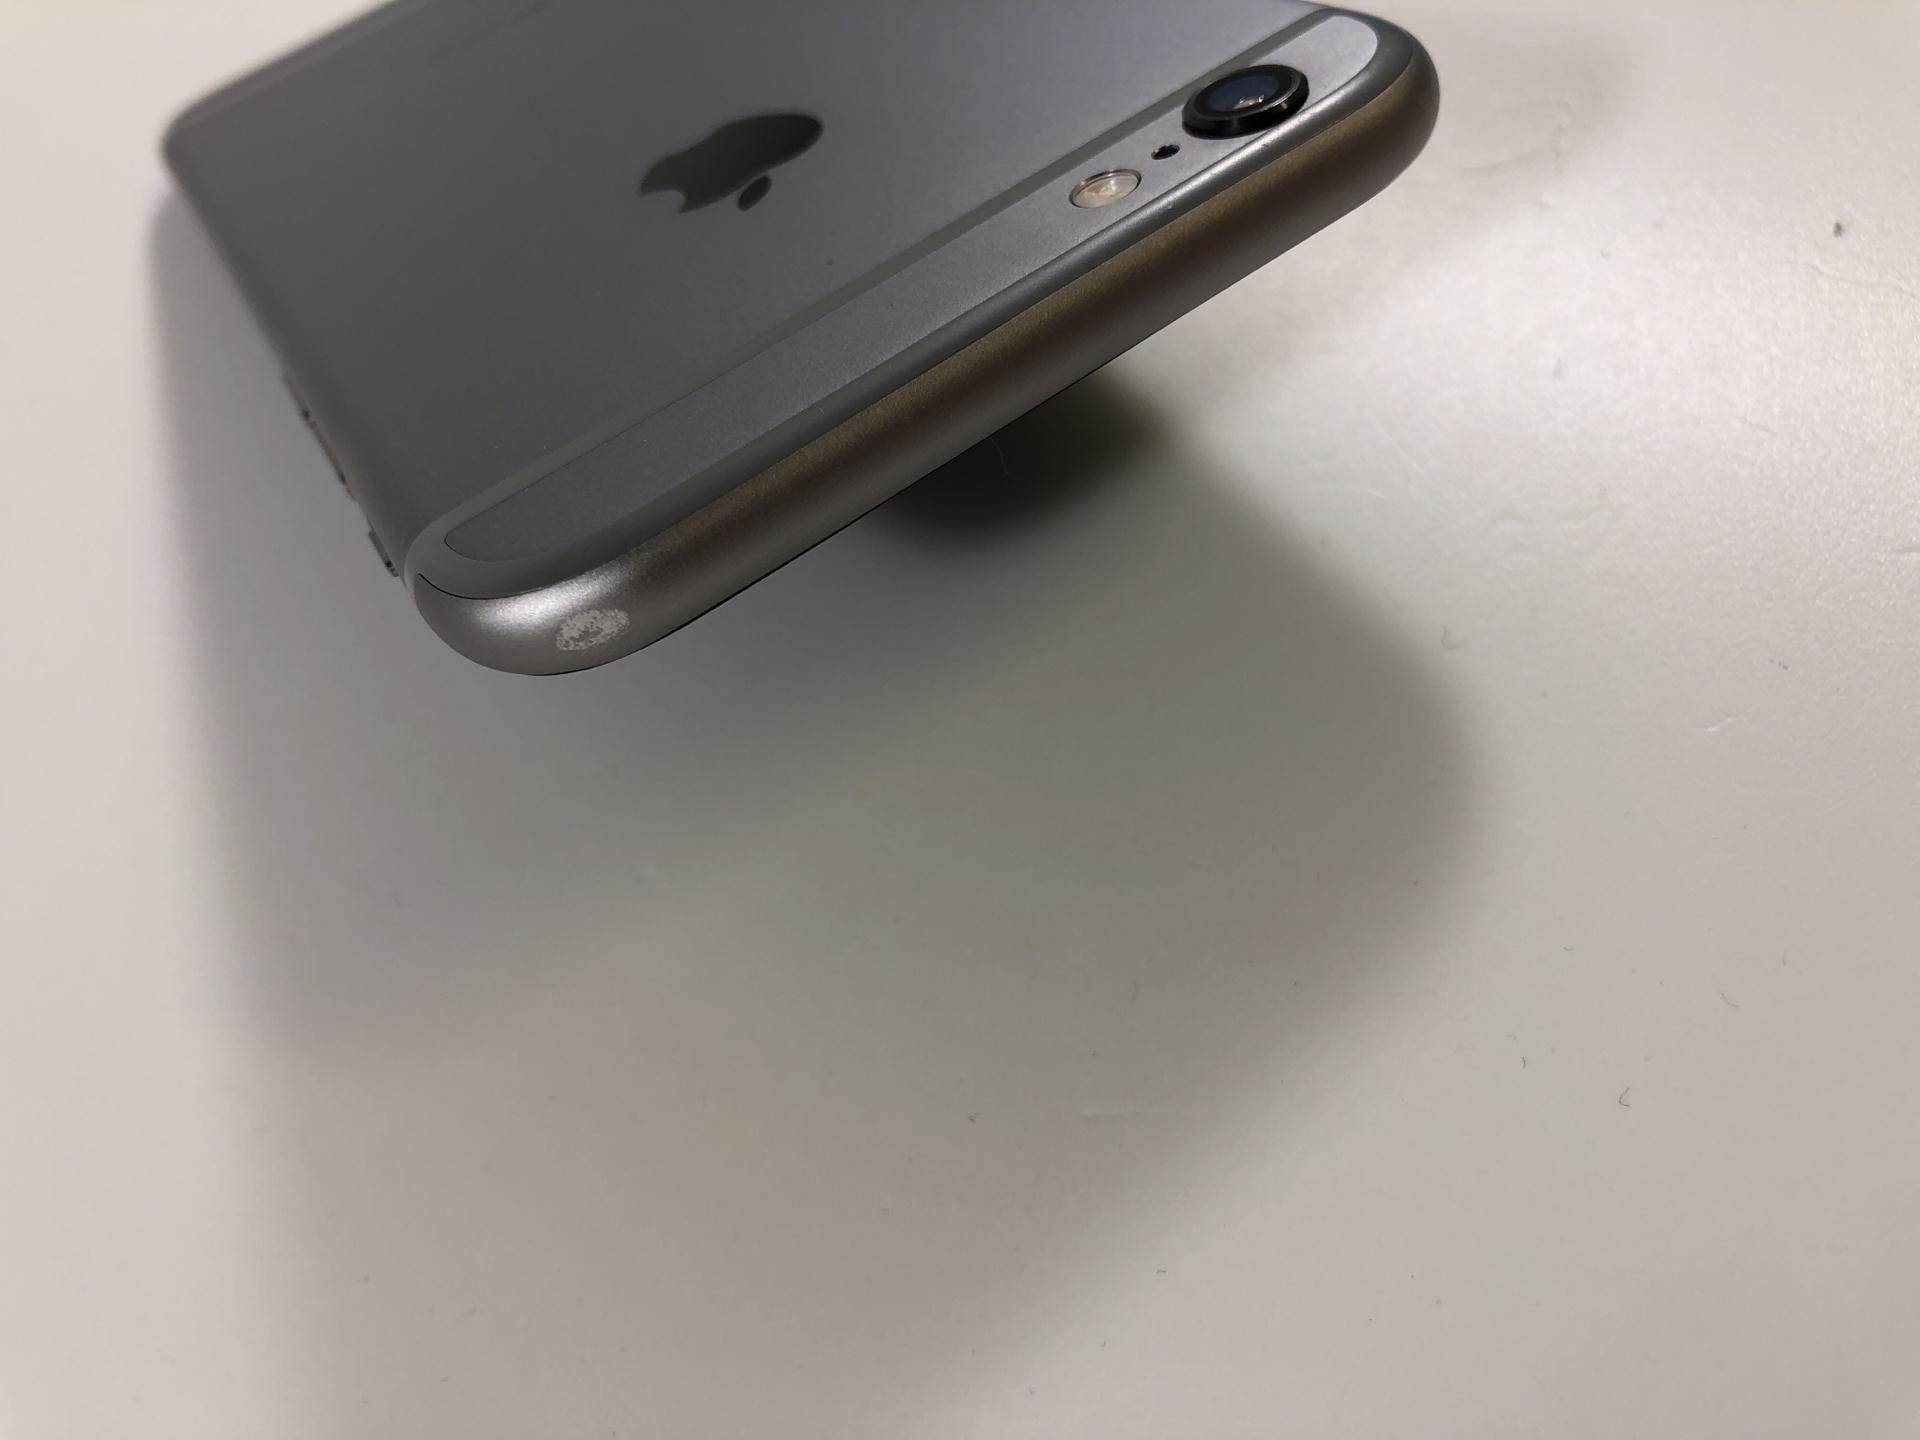 iPhone 6 16GB, 16GB, Space Gray, bild 3